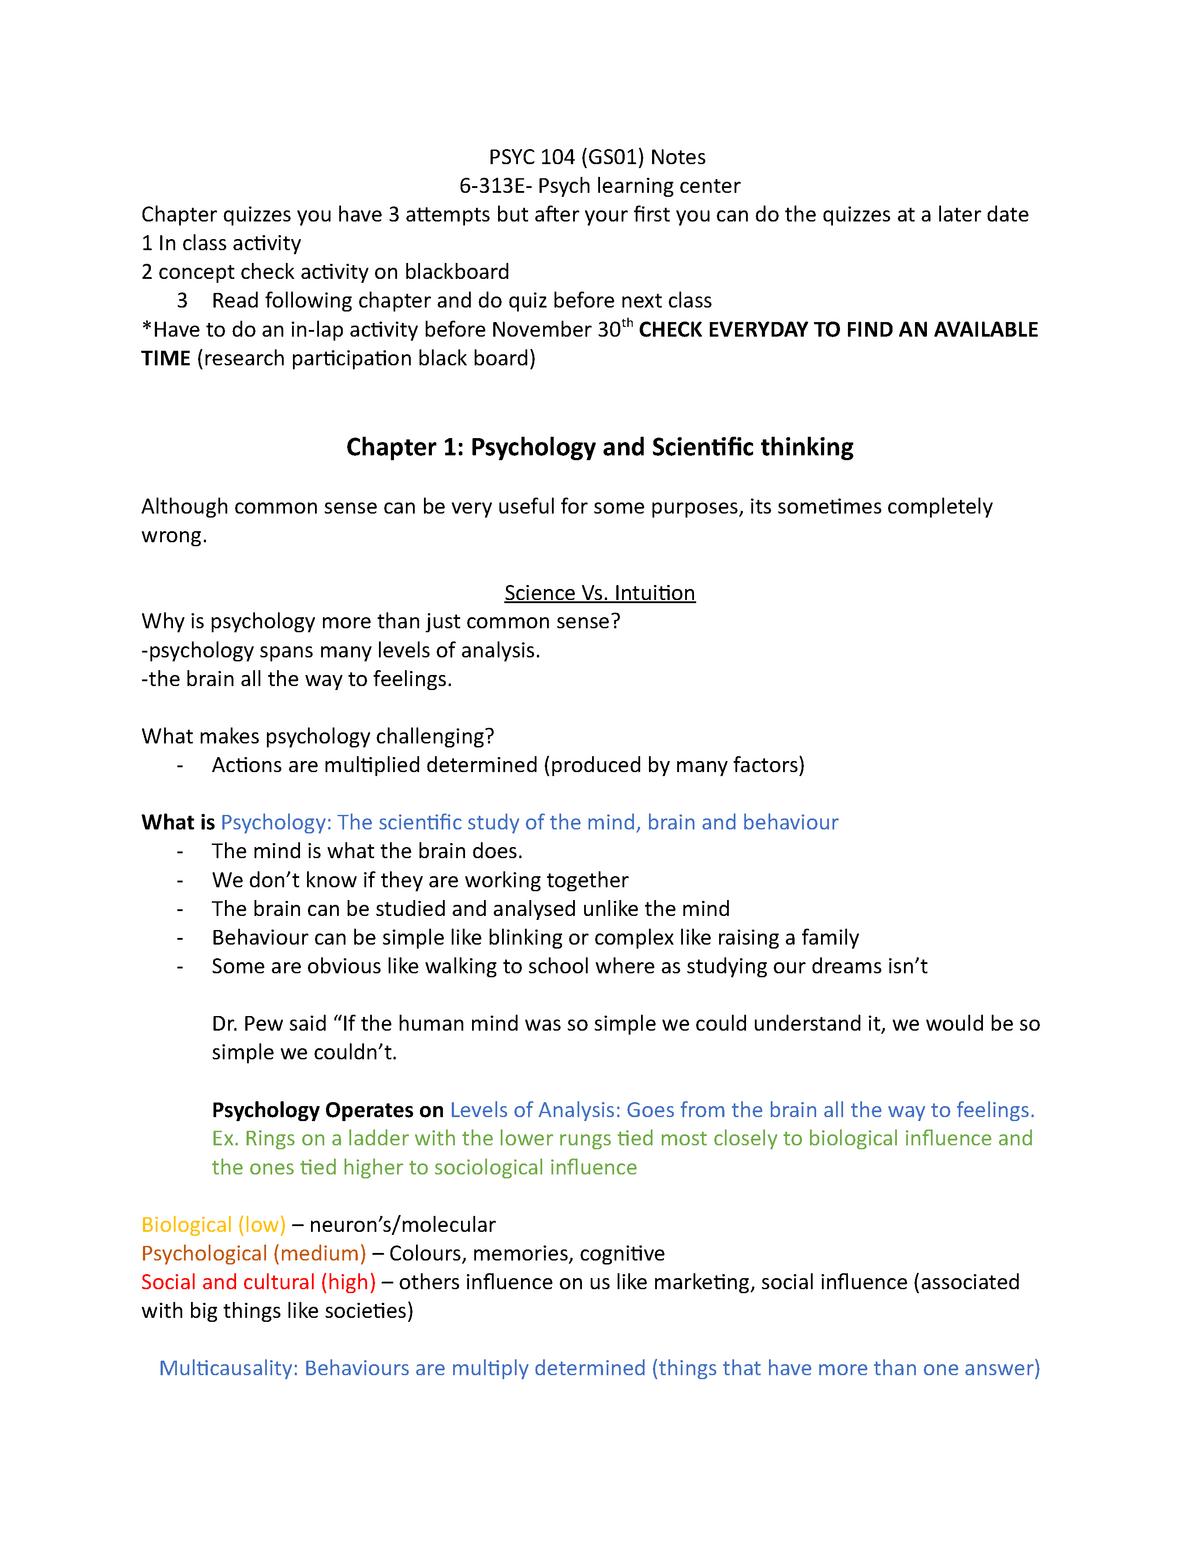 PSYC 104 Notes - 10142: Introductory Psychology I (Psyc 104) - StuDocu